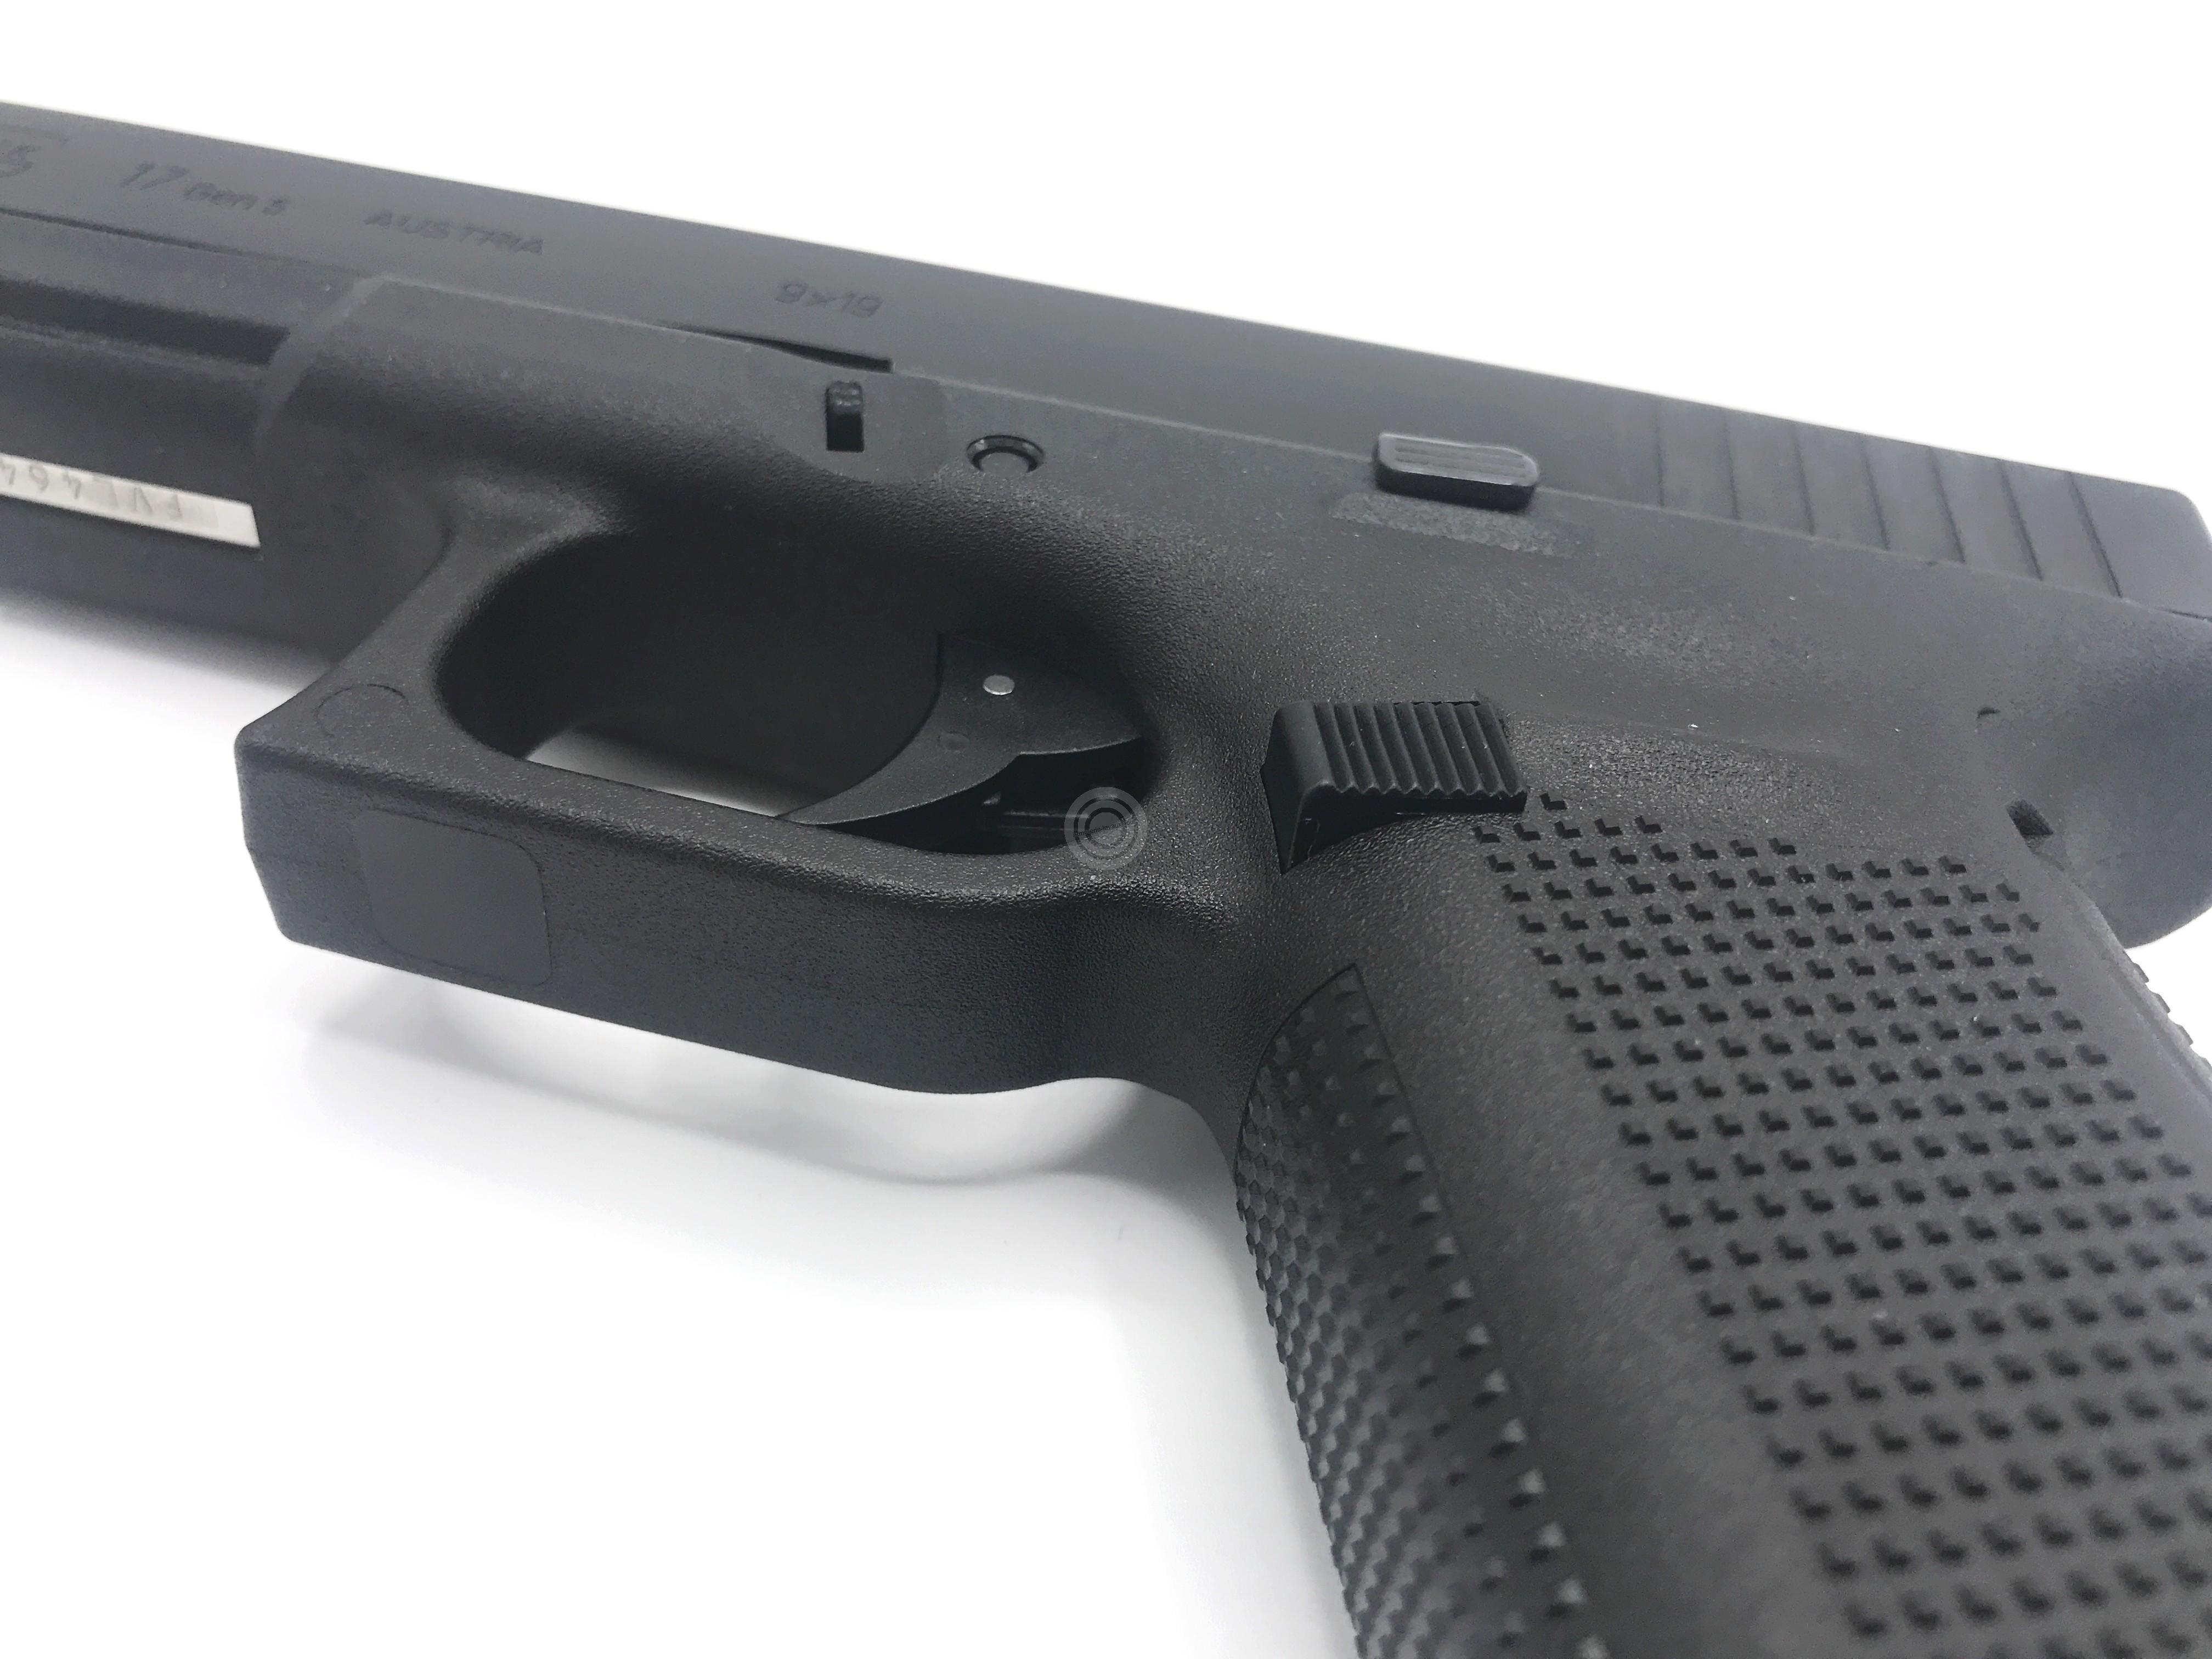 Pistolet GLOCK 17 Gen5 MOS FS cal 9x19 - Armurerie Lavaux